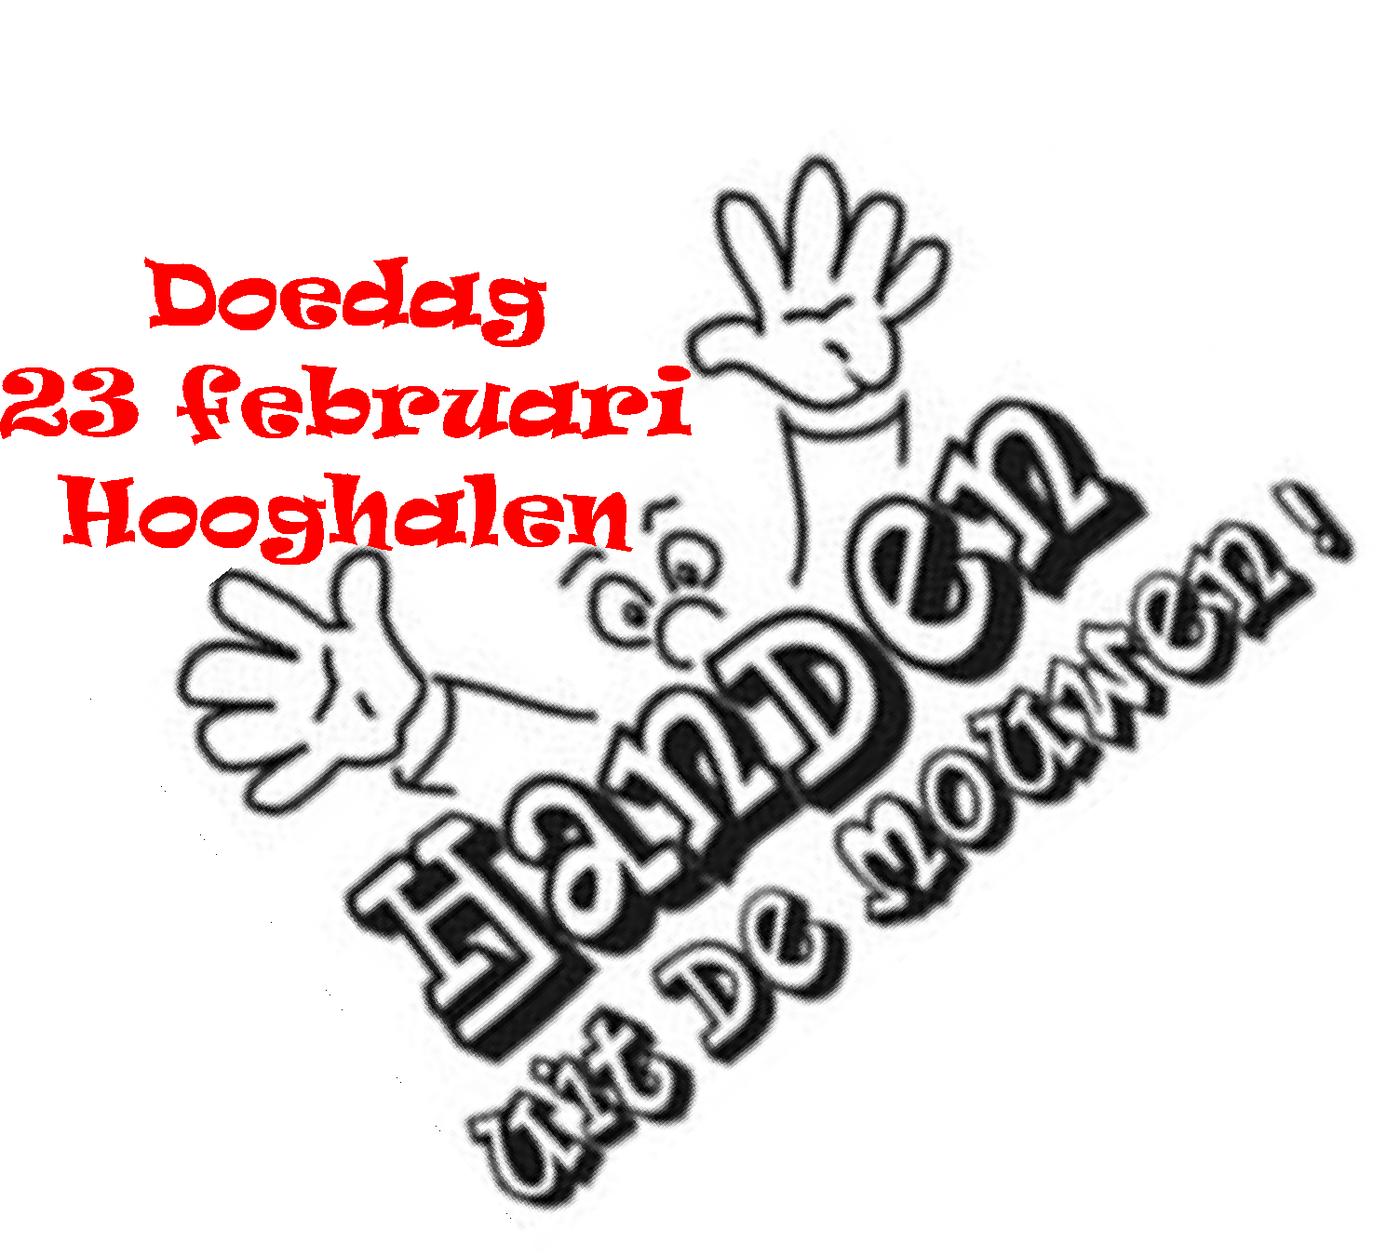 Doedag 23 februari 2019